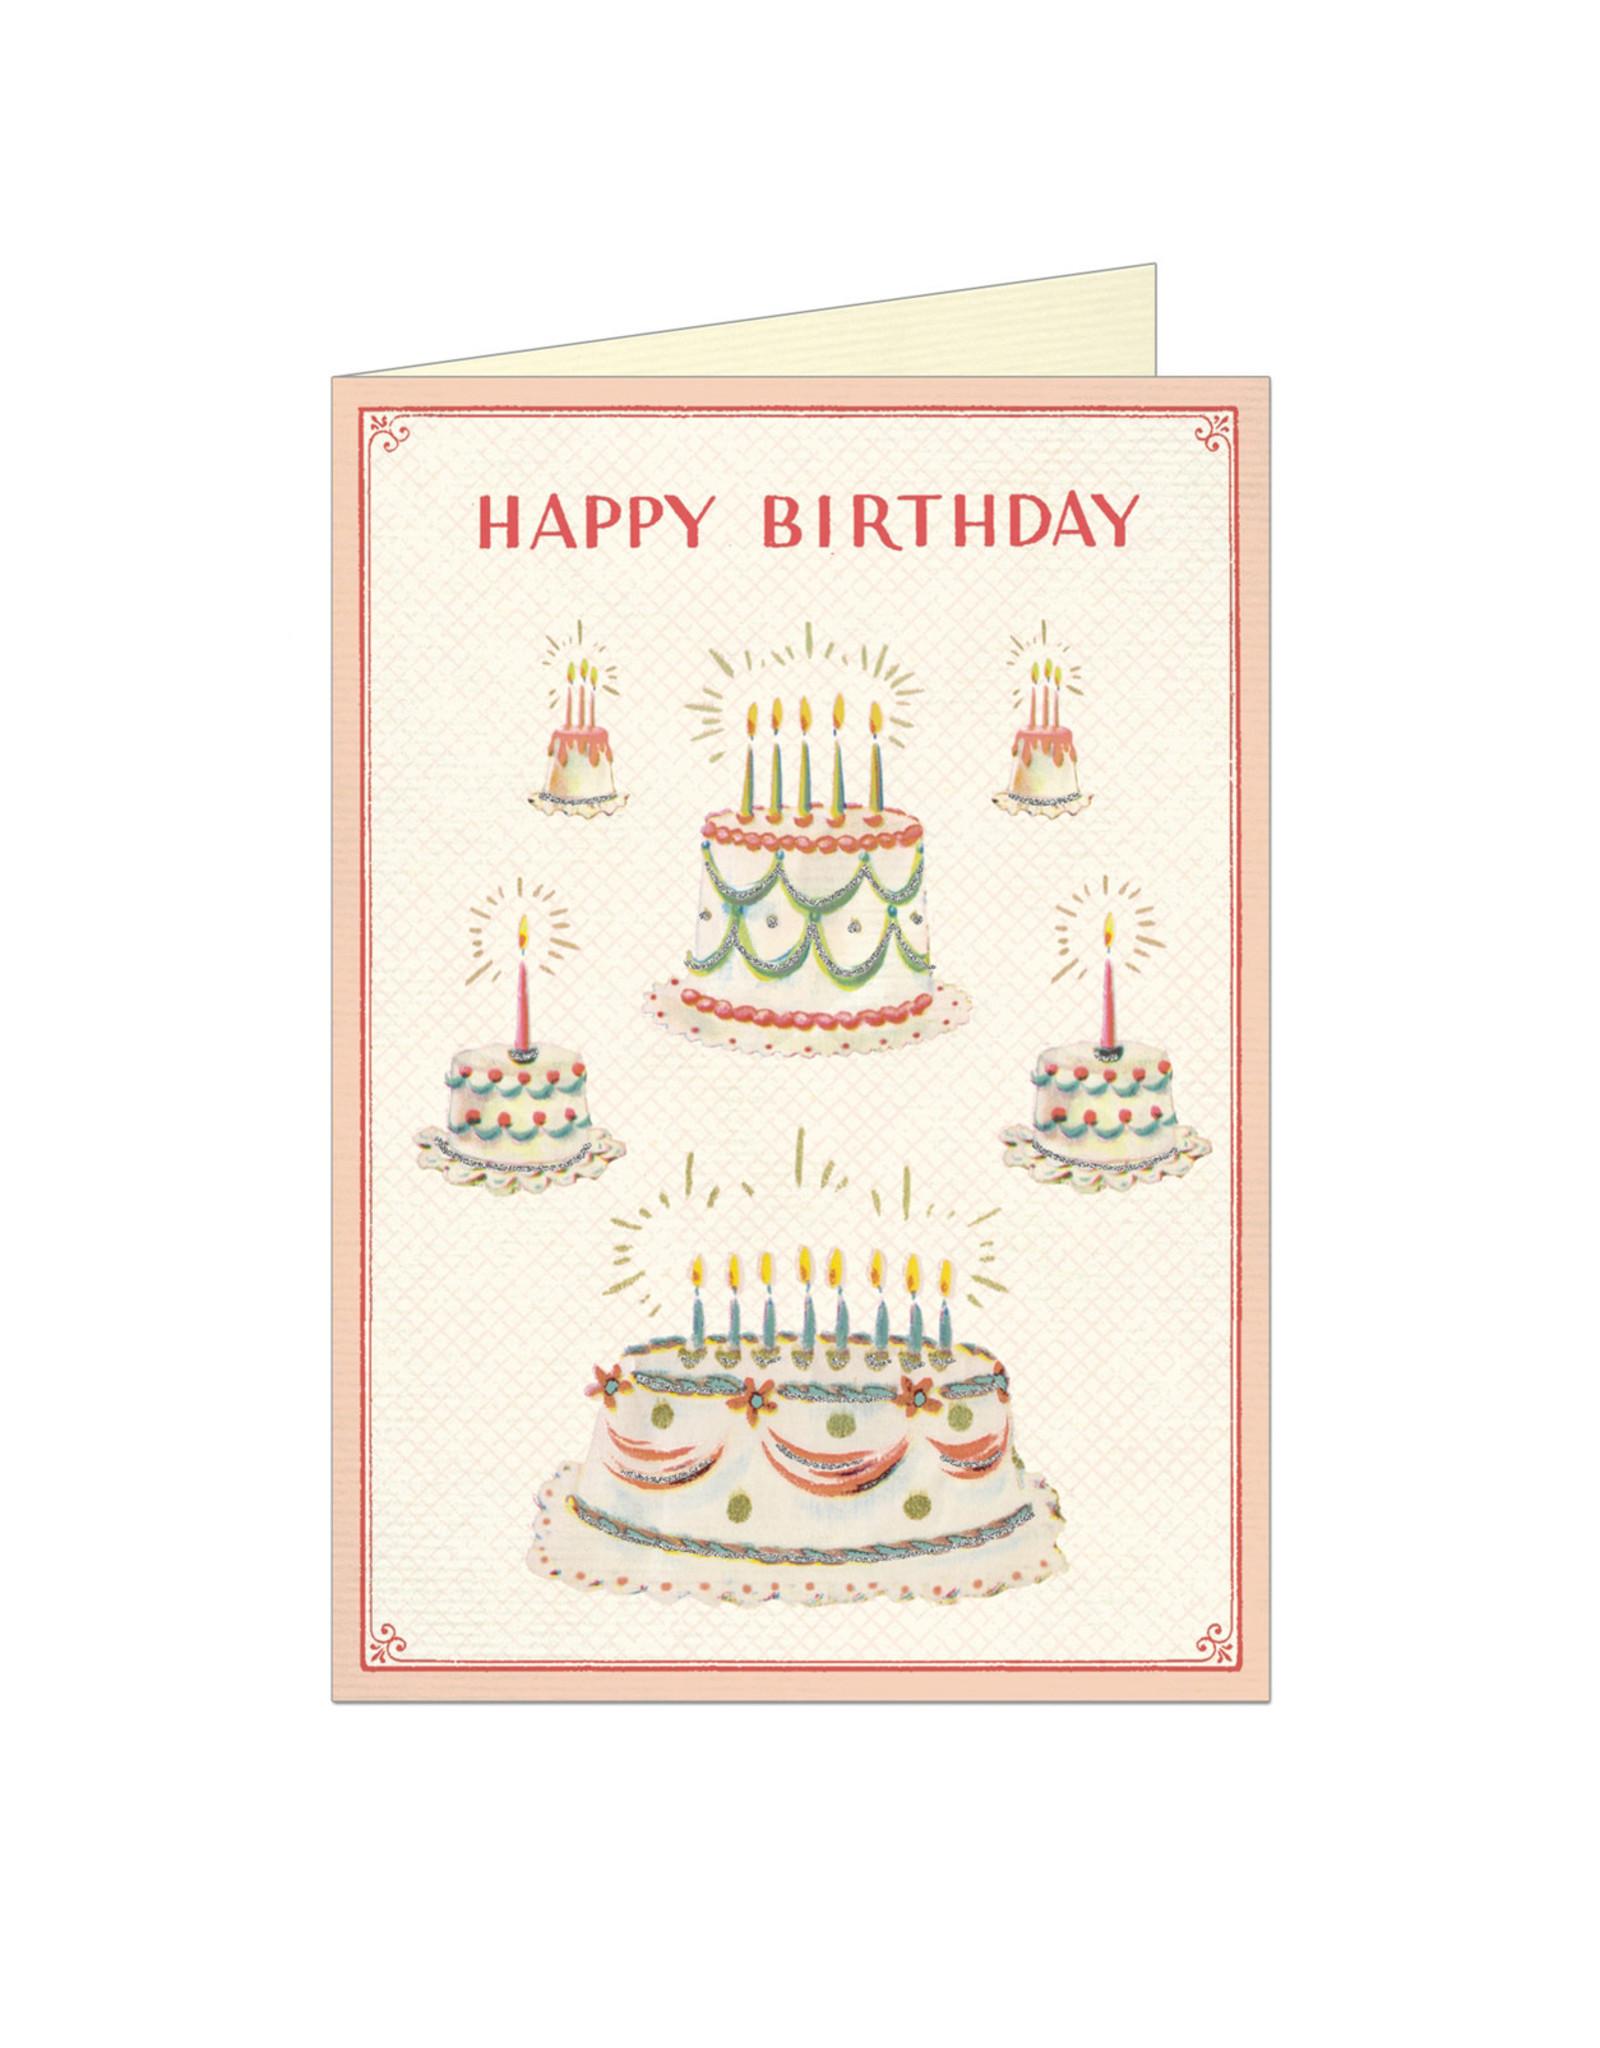 Cavallini Papers & Co. Happy Birthday Cake 2 Notecard